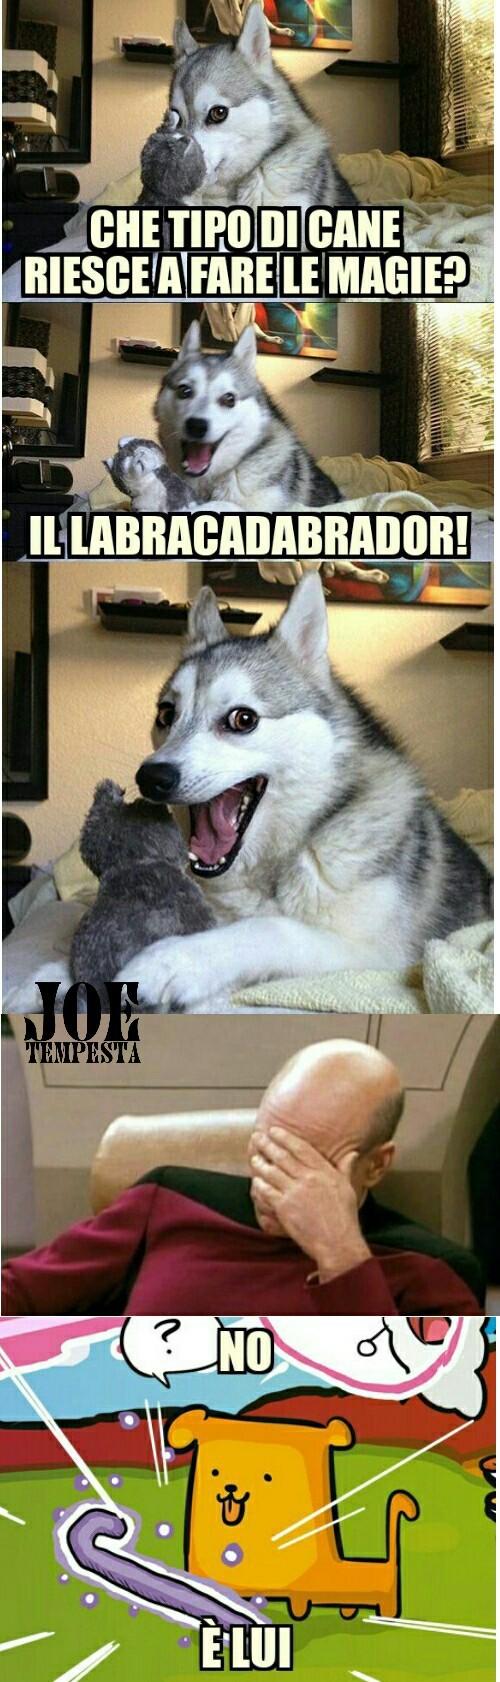 Quisquilie e pinzillacchere - meme